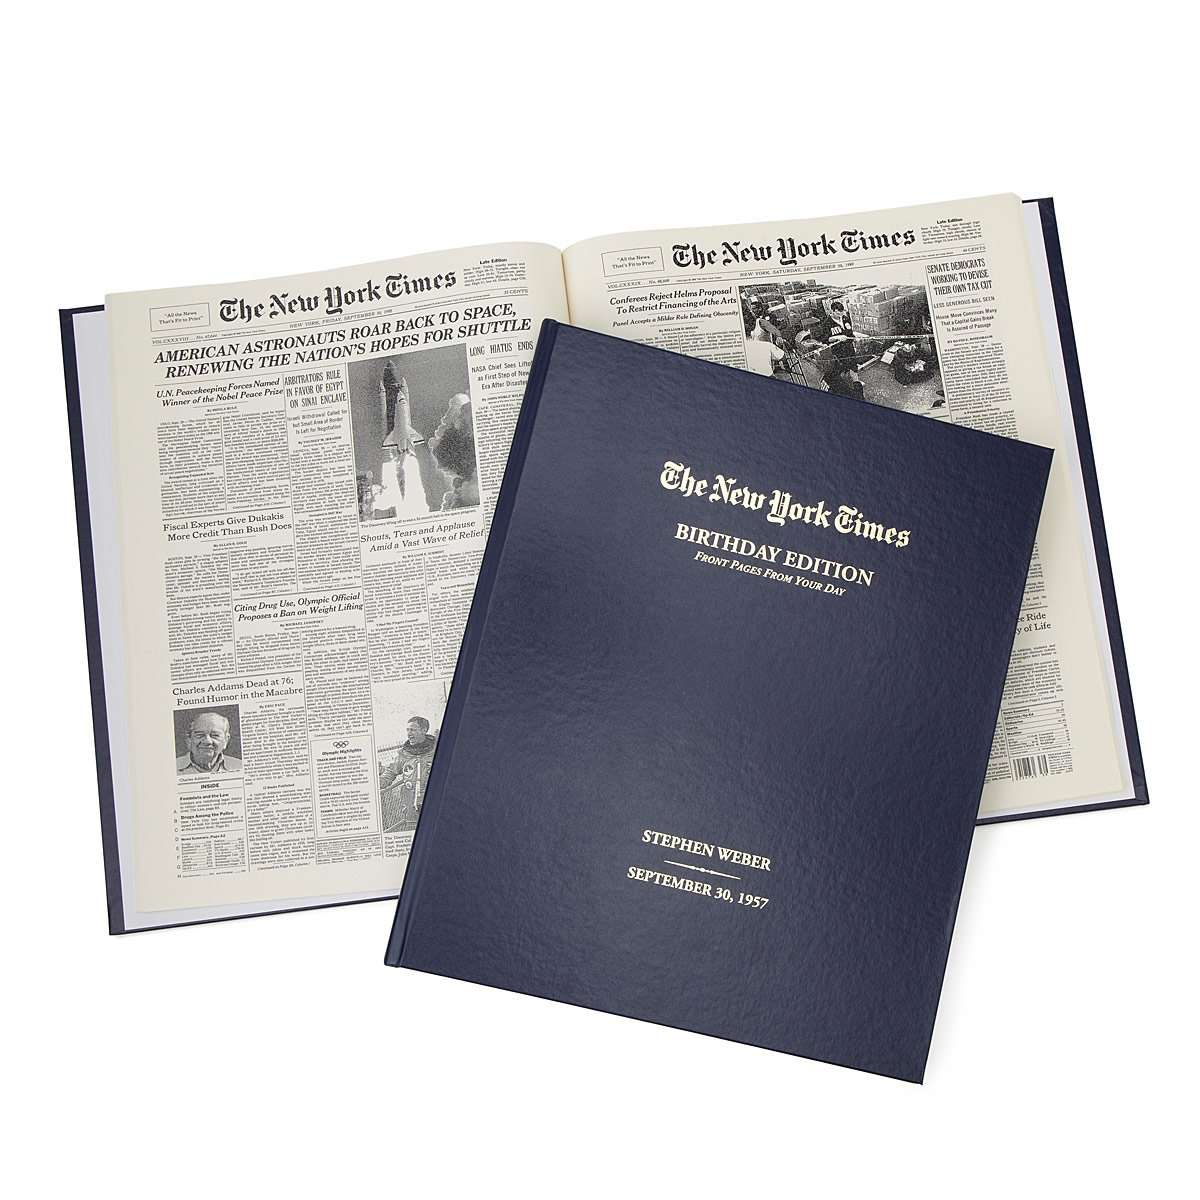 new-york-times-birthday-book